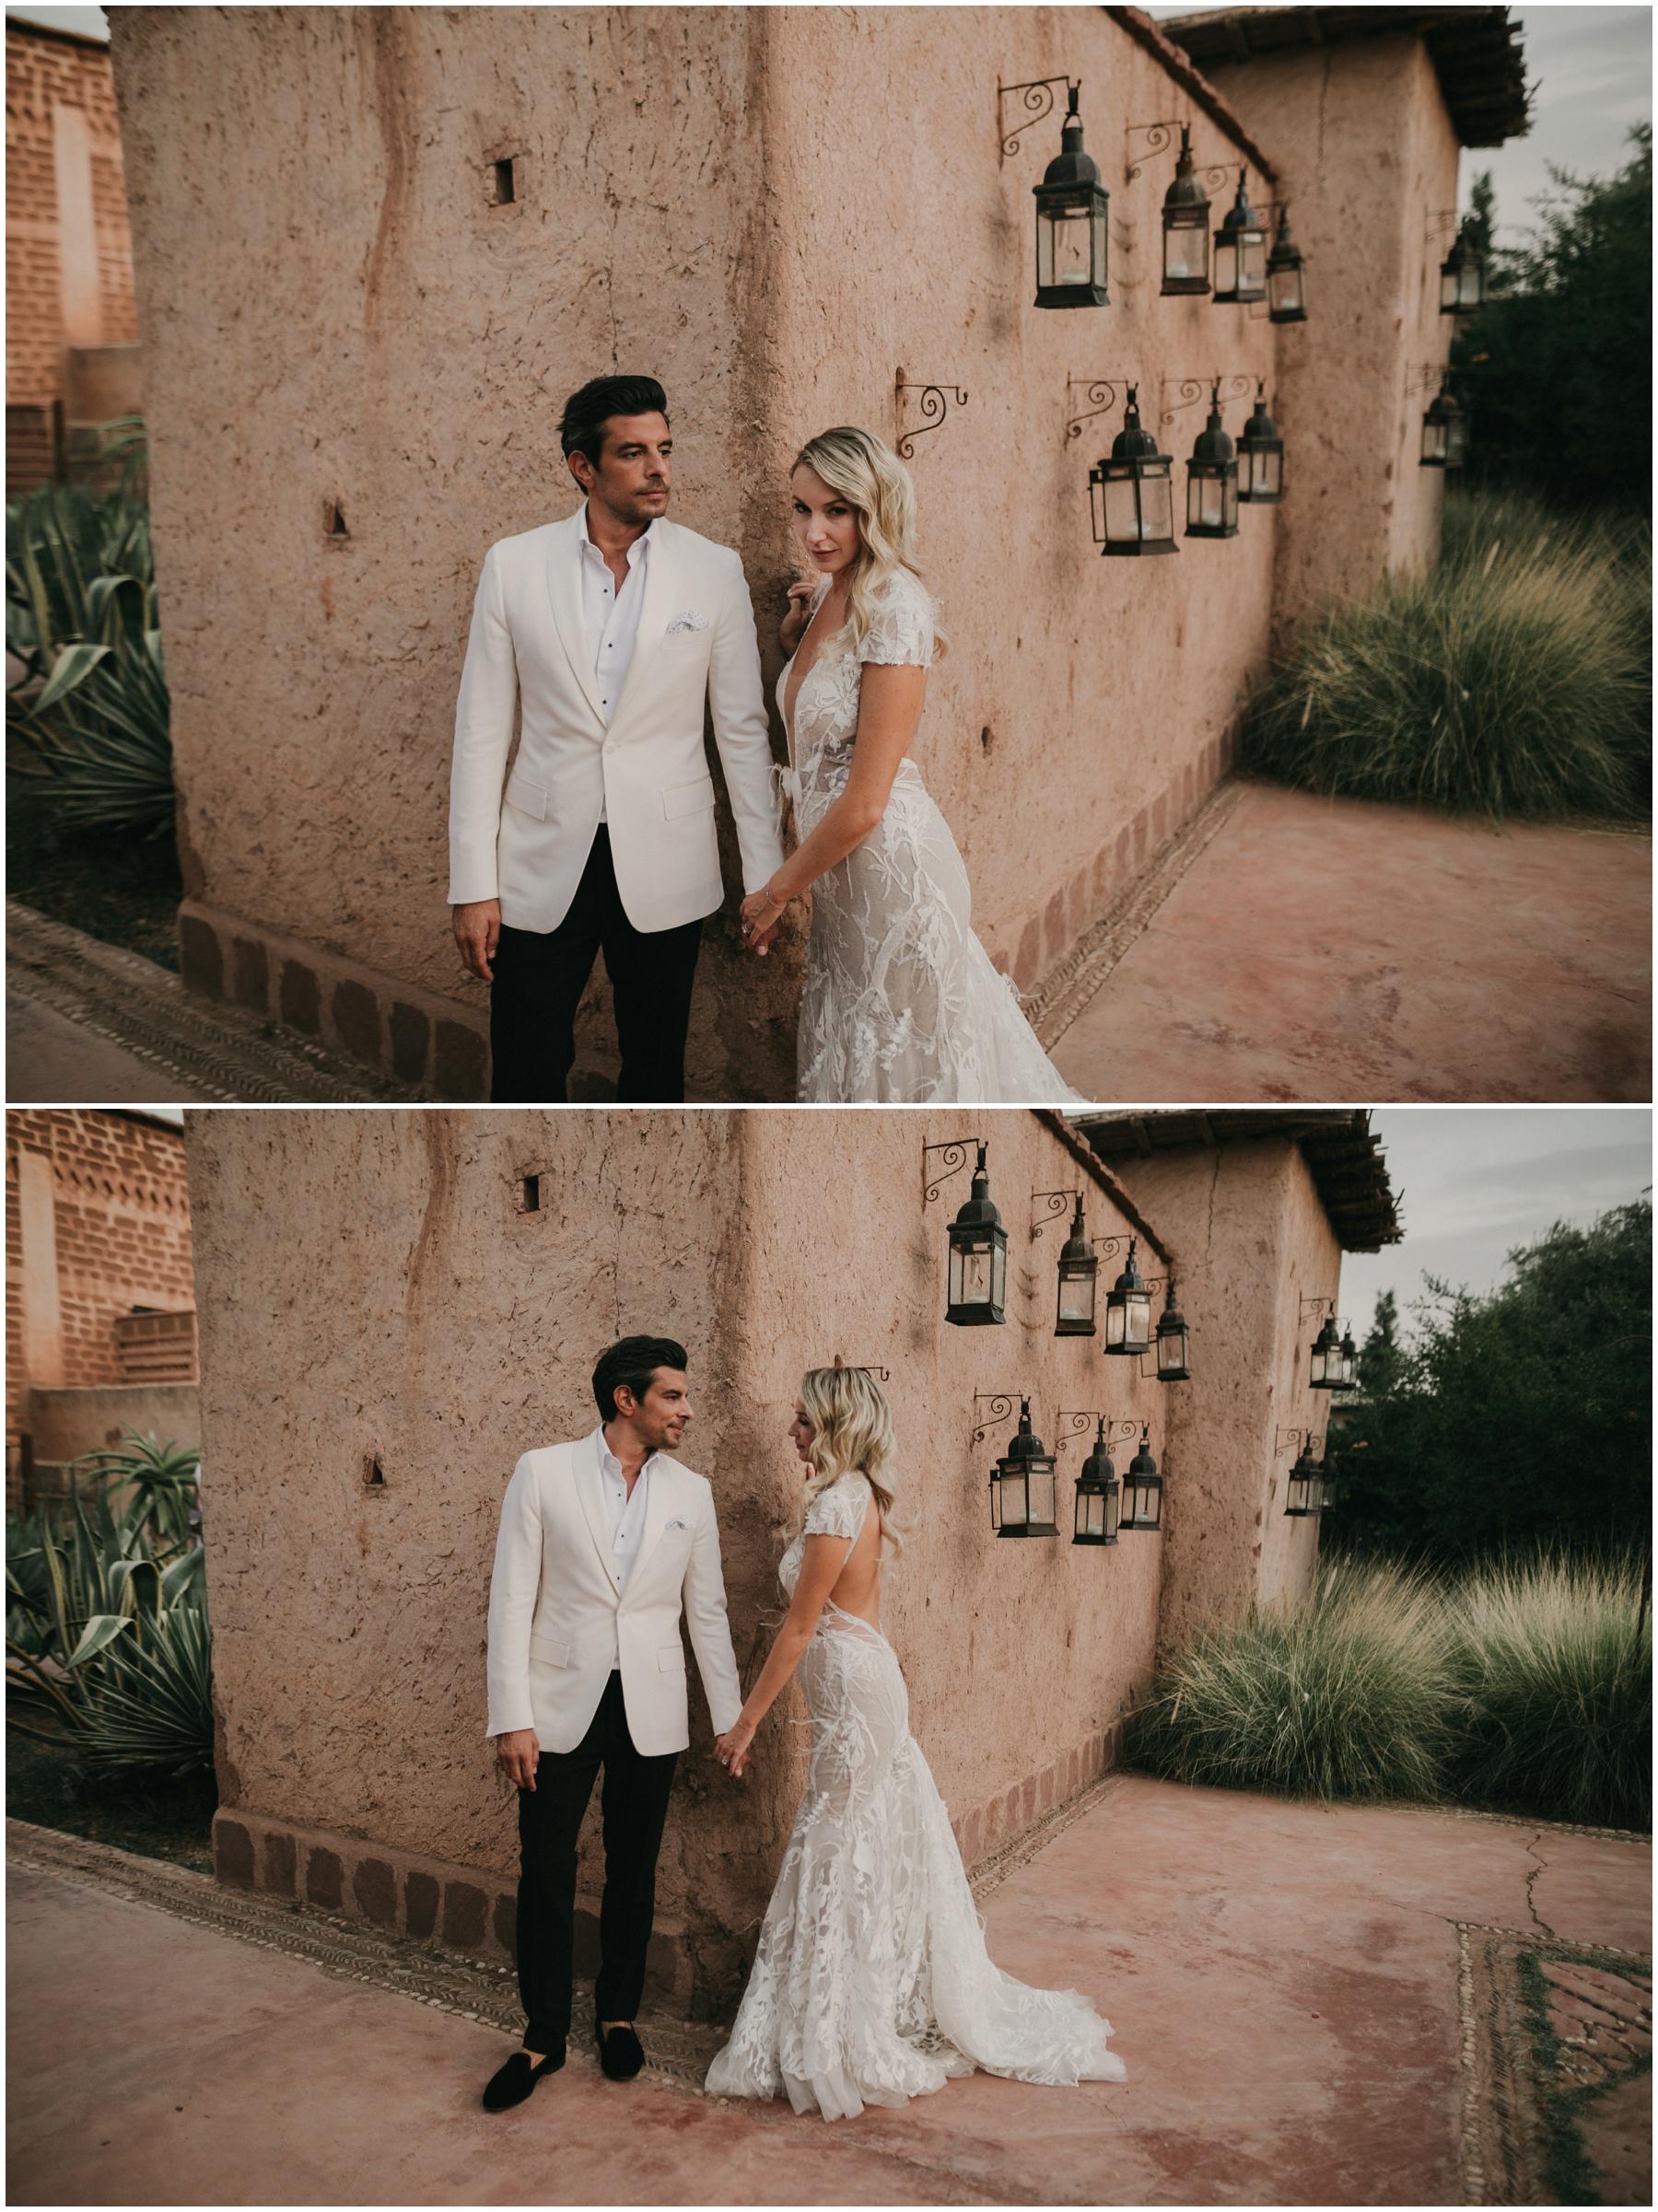 Marrakech Wedding Beldi Coutry Club 061.JPG